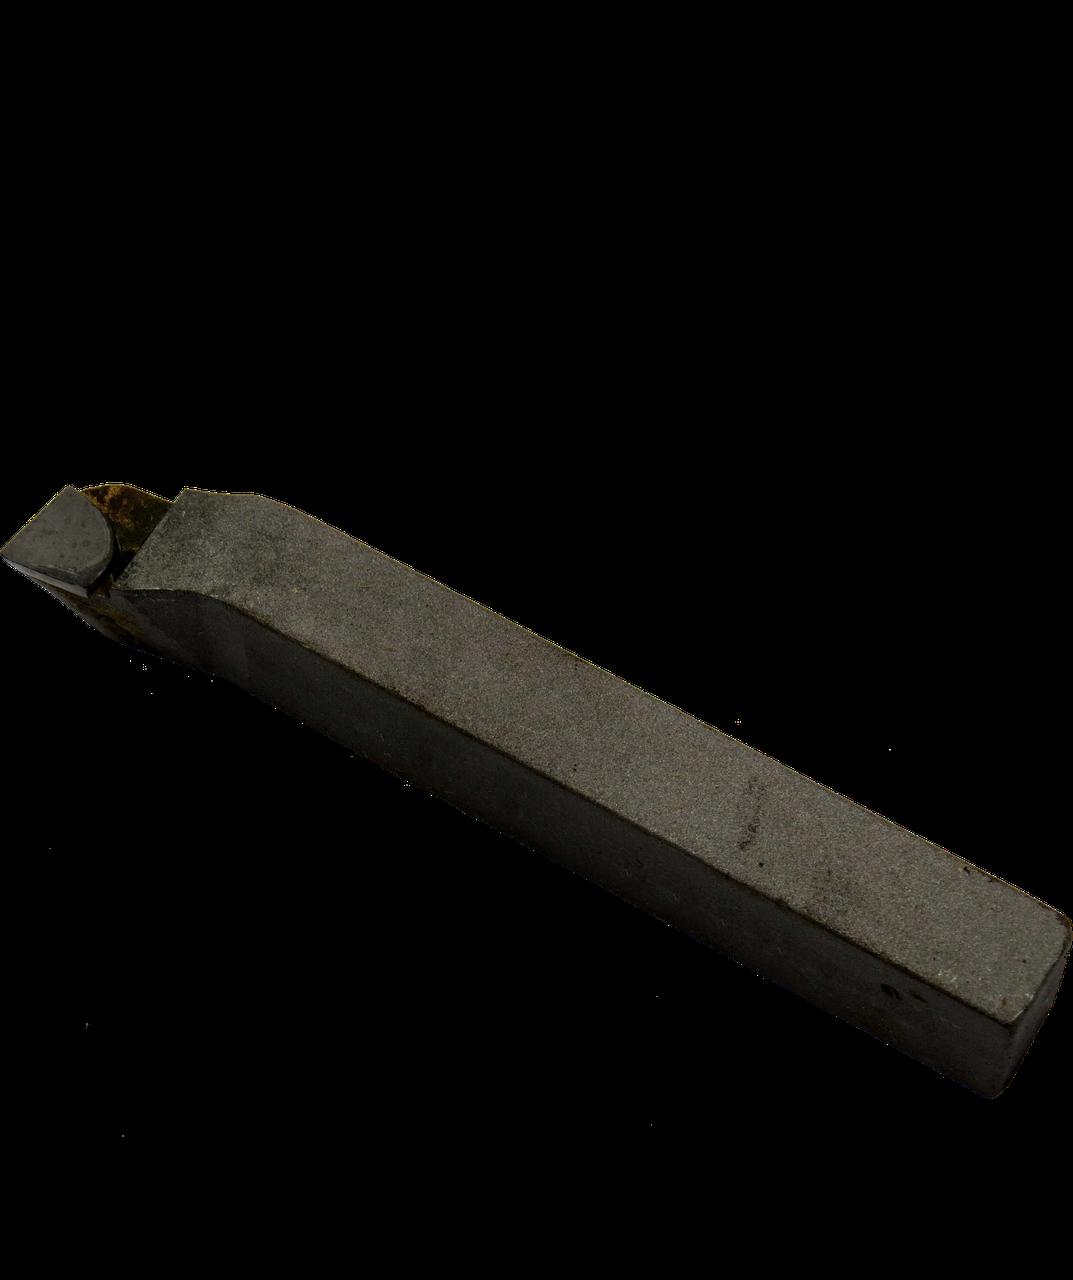 Резец токарный подрезной отогнутый 25х16х140 (Т15К6) СИТО Беларусь